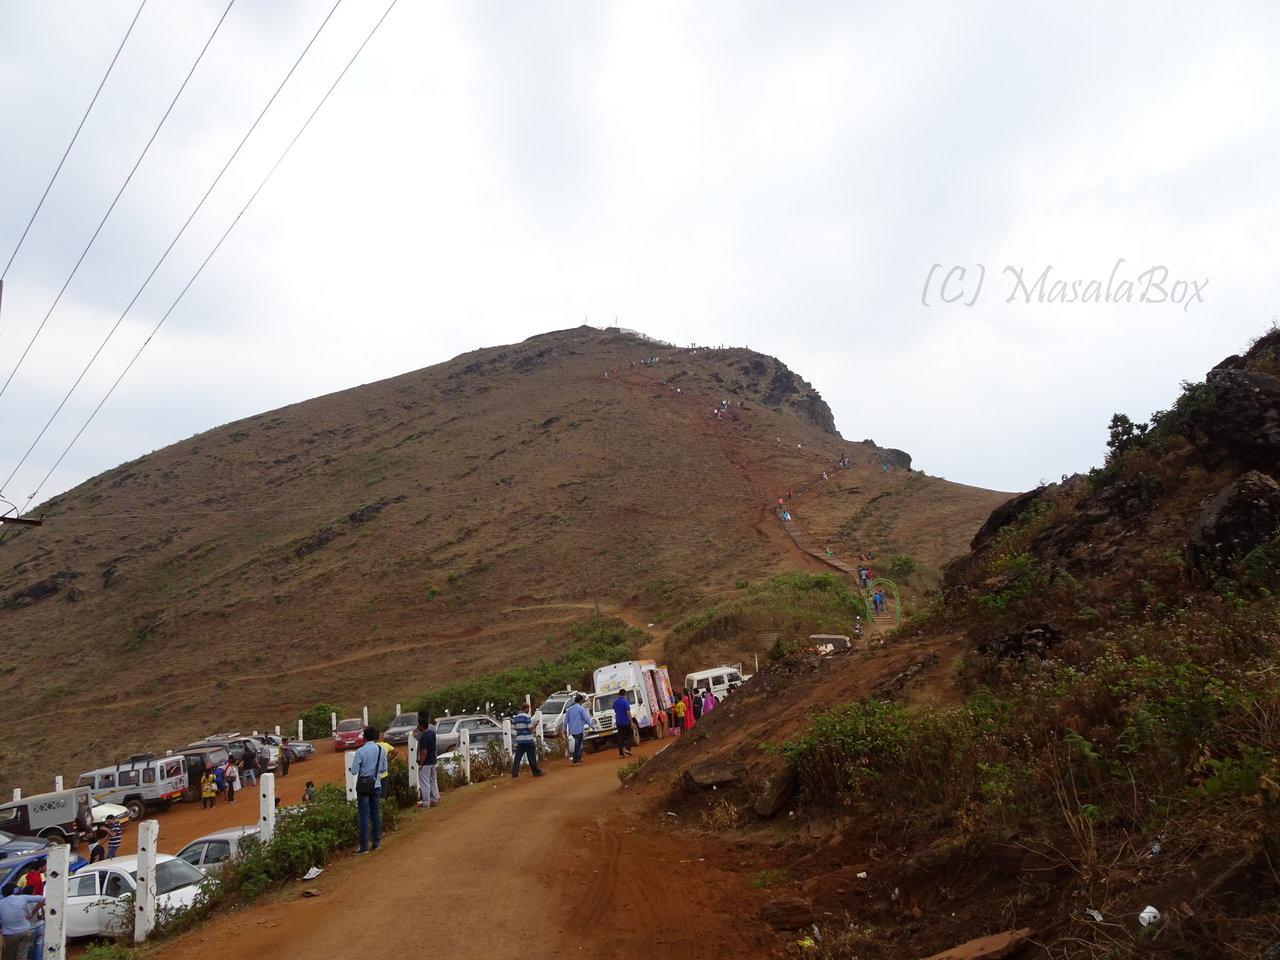 Chikmagalur - Crowded Mullayanagiri